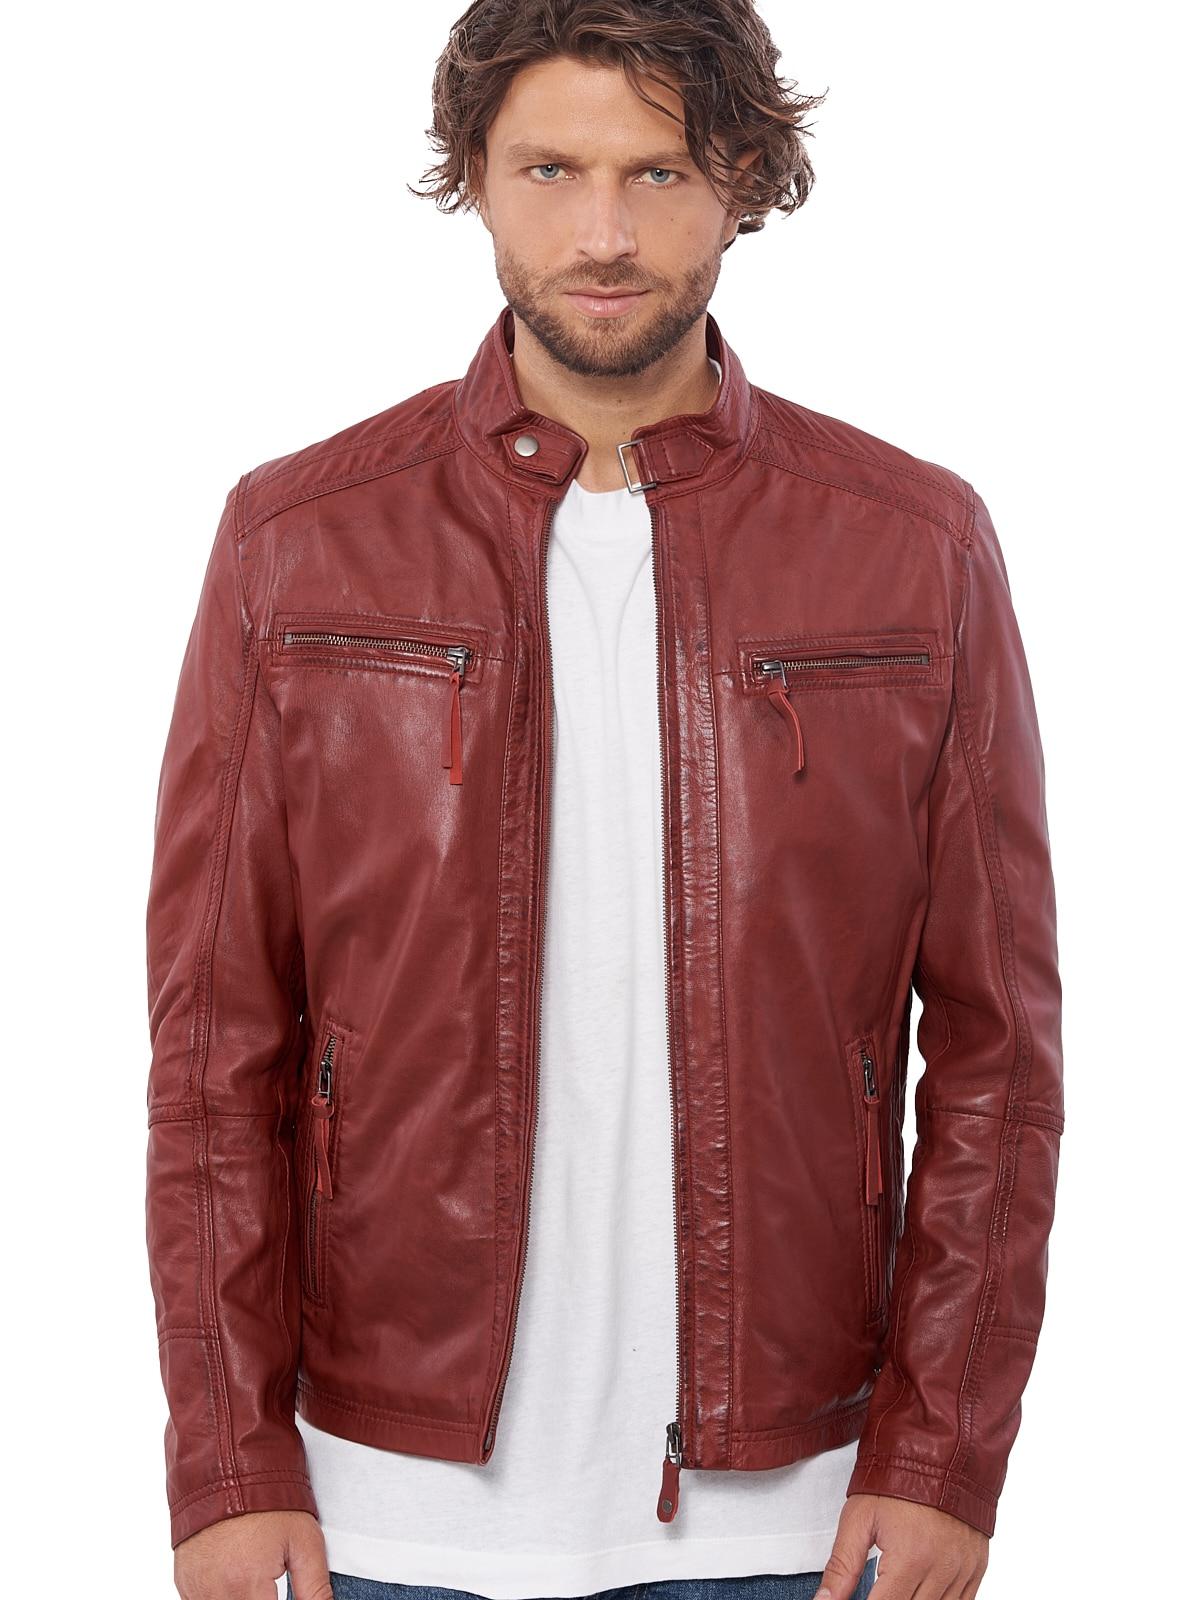 H68109fa20b7449e4a62f7f1995c484178 VAINAS European Brand Mens Genuine Leather jacket for men Winter Real sheep leather jacket Motorcycle jackets Biker jackets Alfa